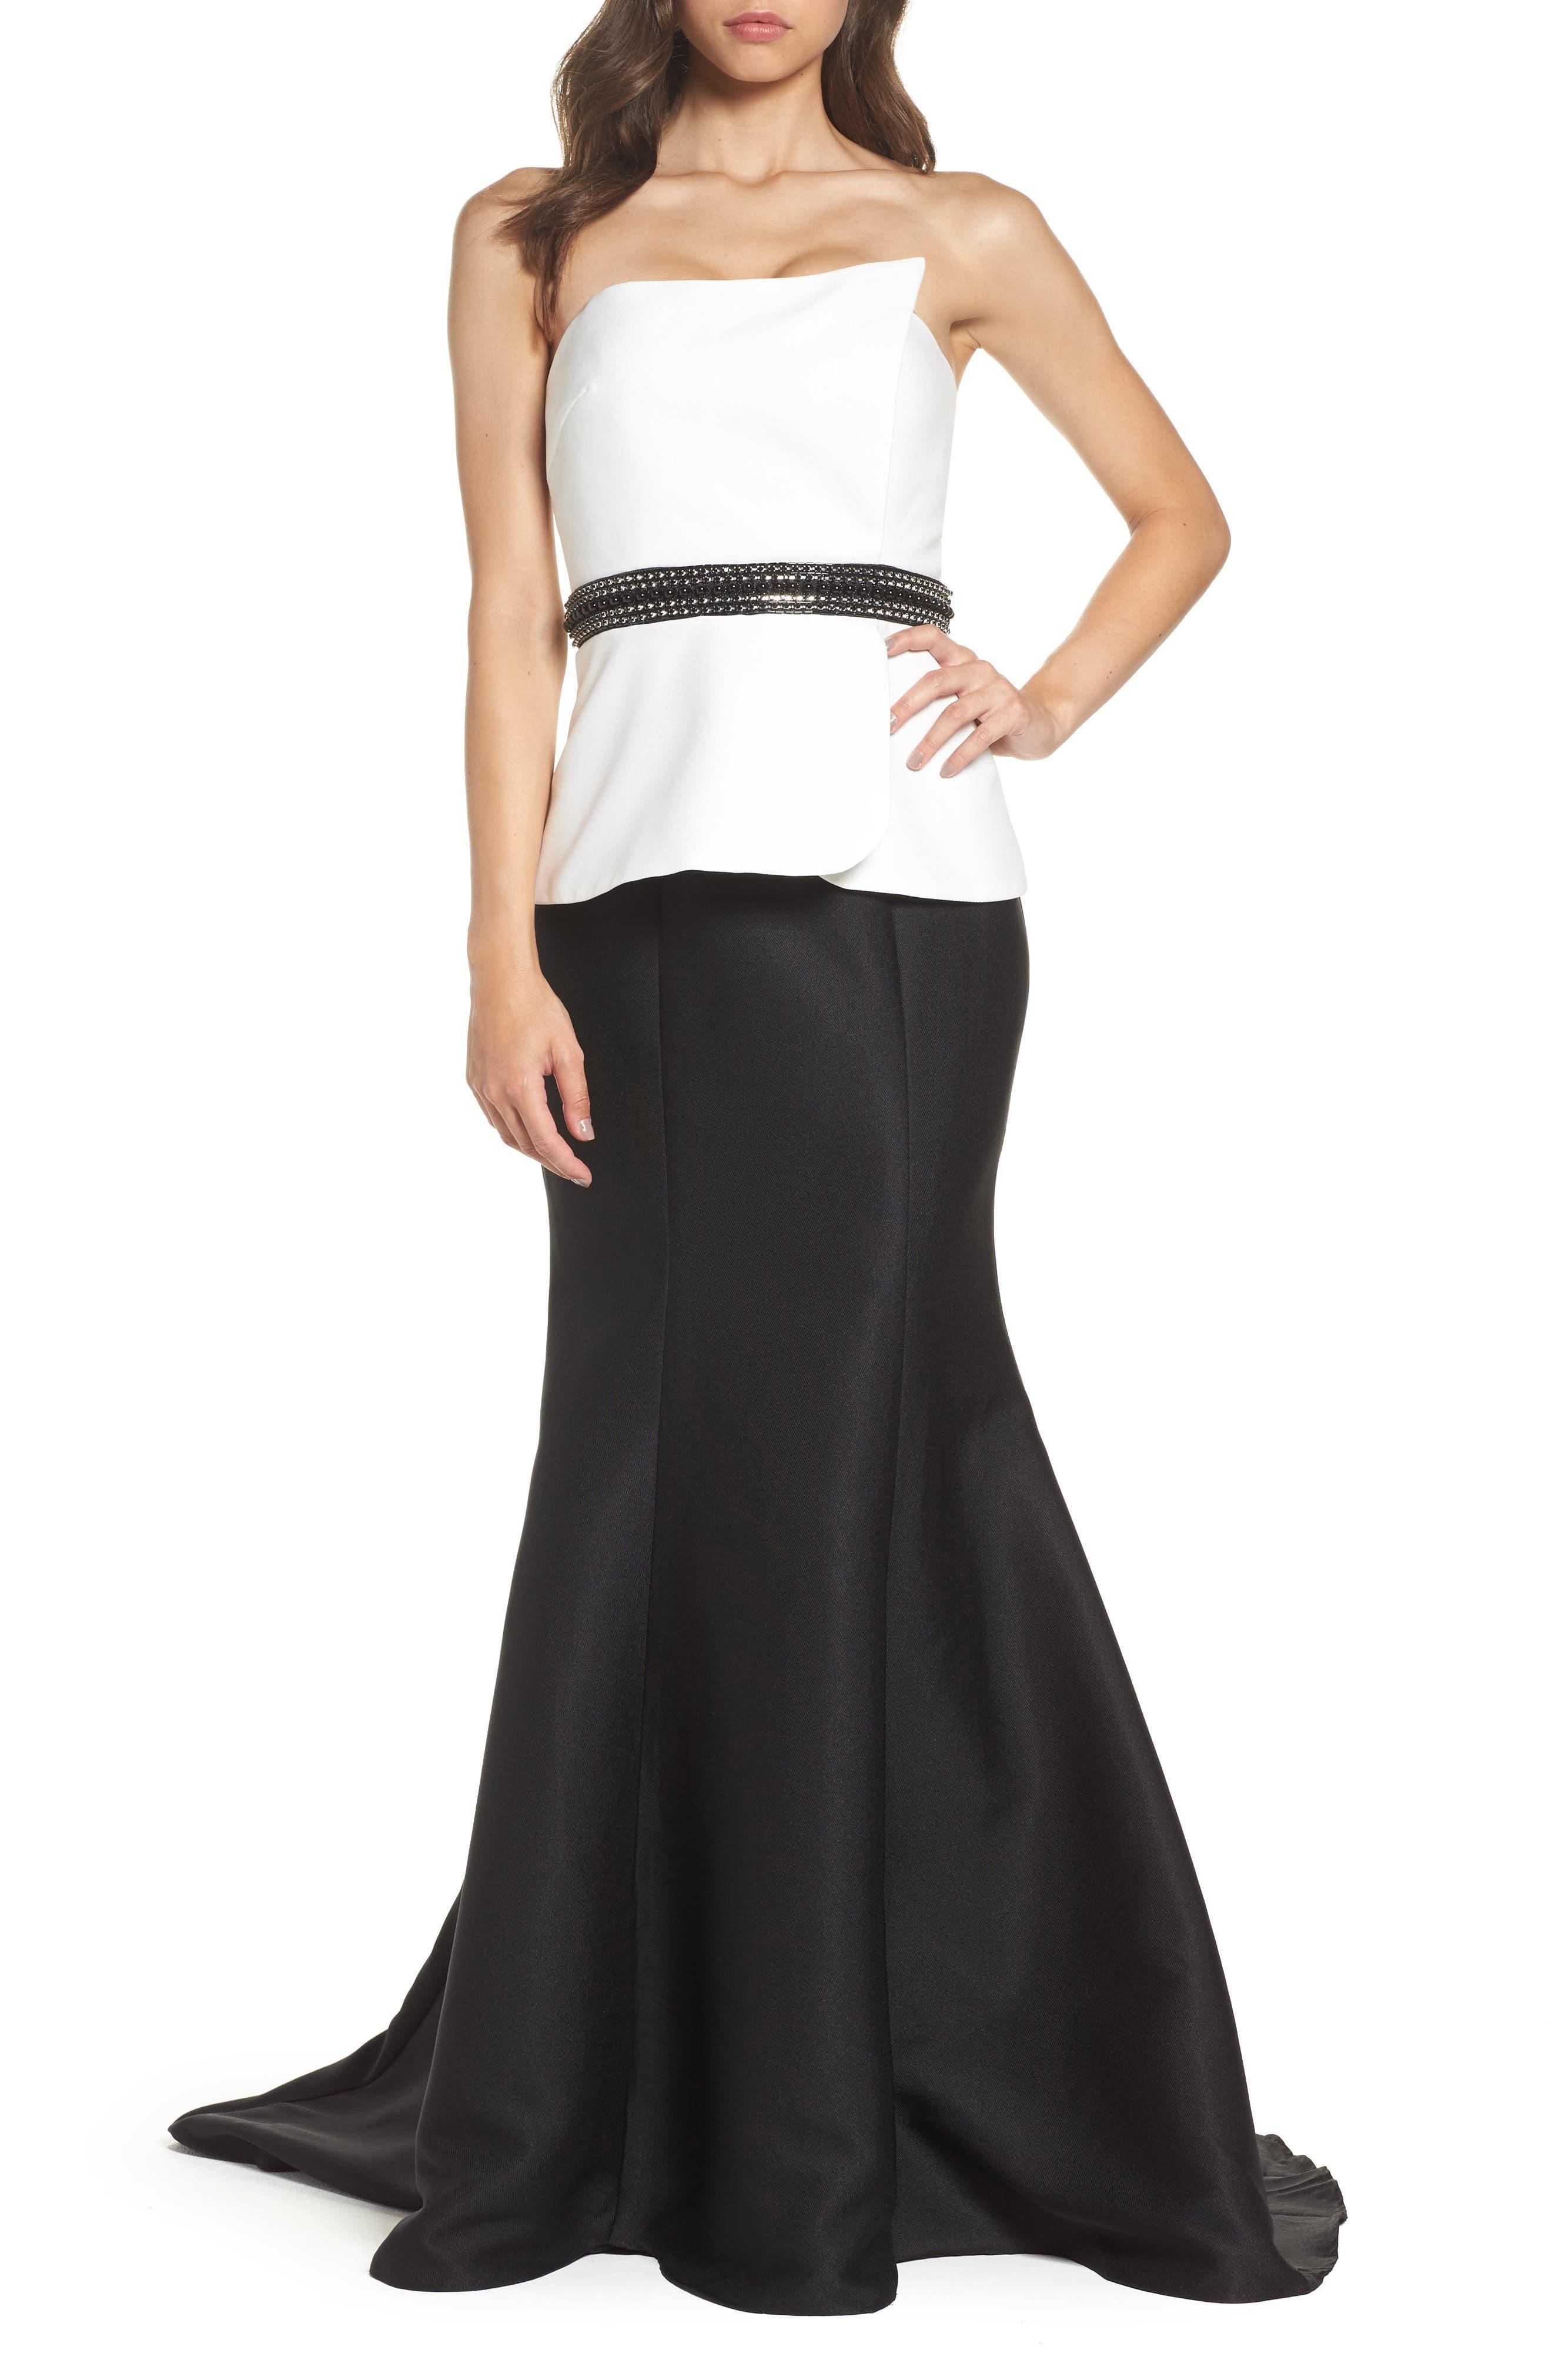 Color Block Strapless Mermaid Gown,                             Main thumbnail 1, color,                             Black/ White